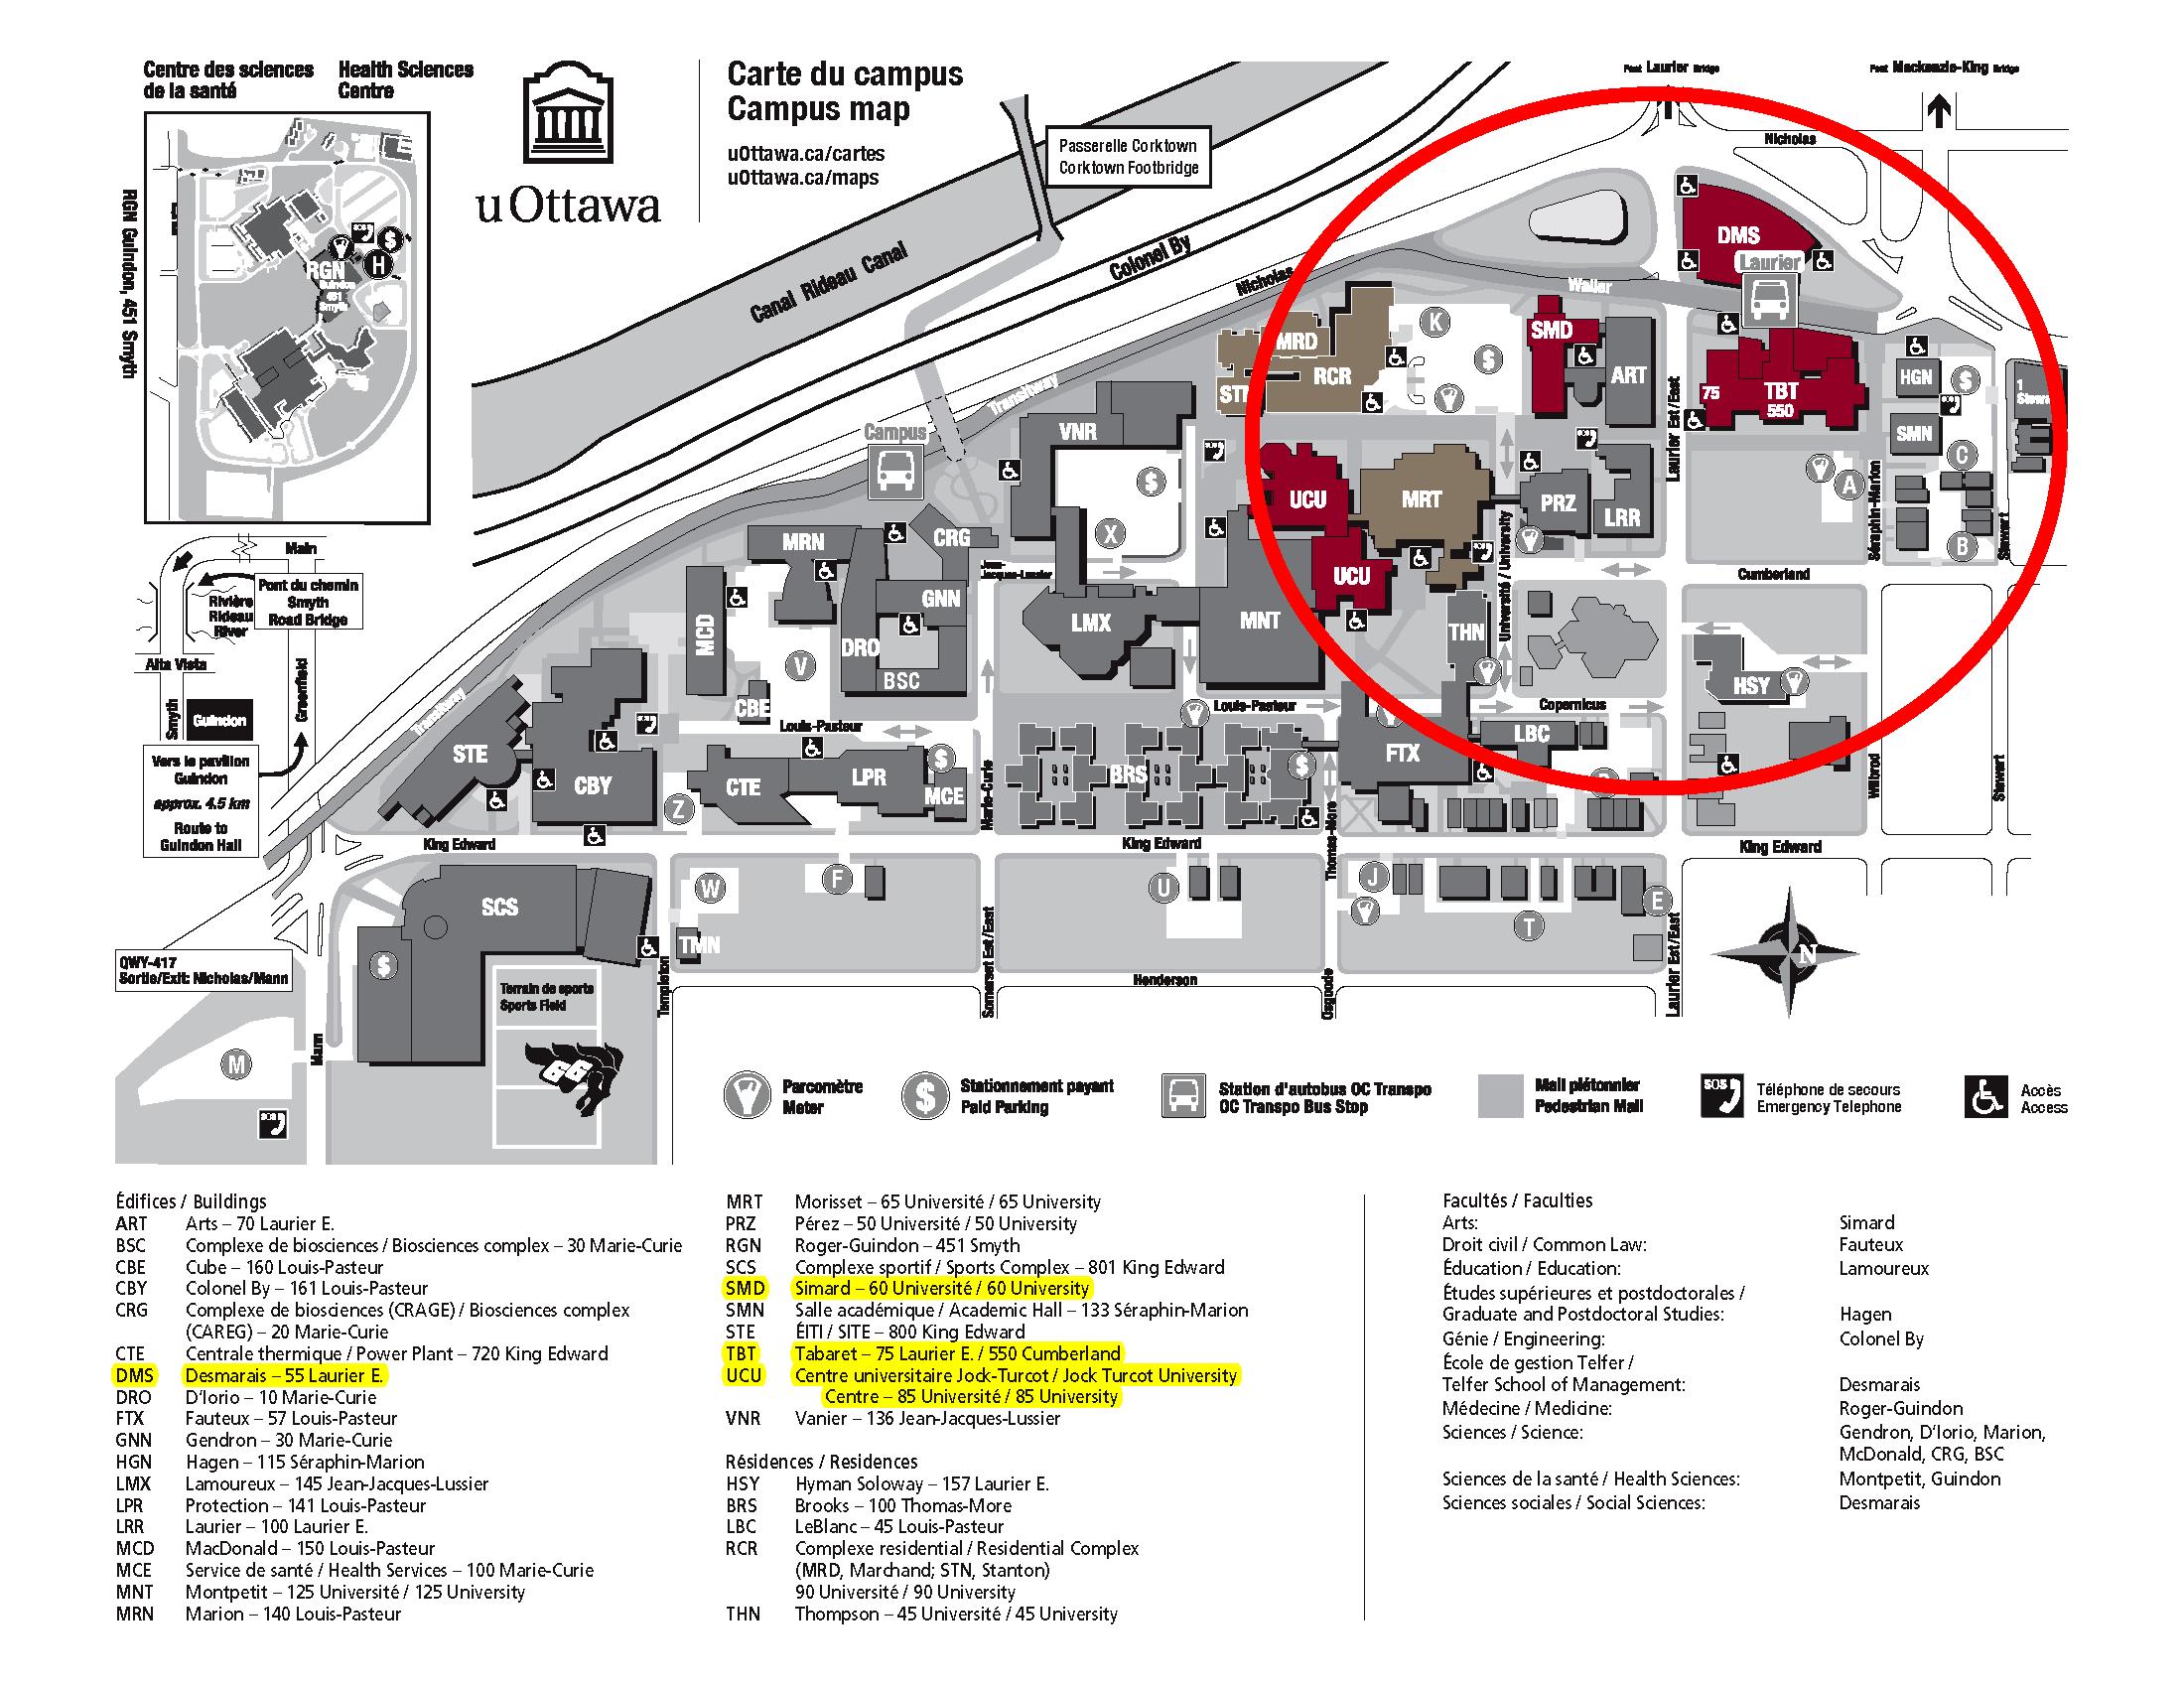 U Of O Campus Map | compressportnederland